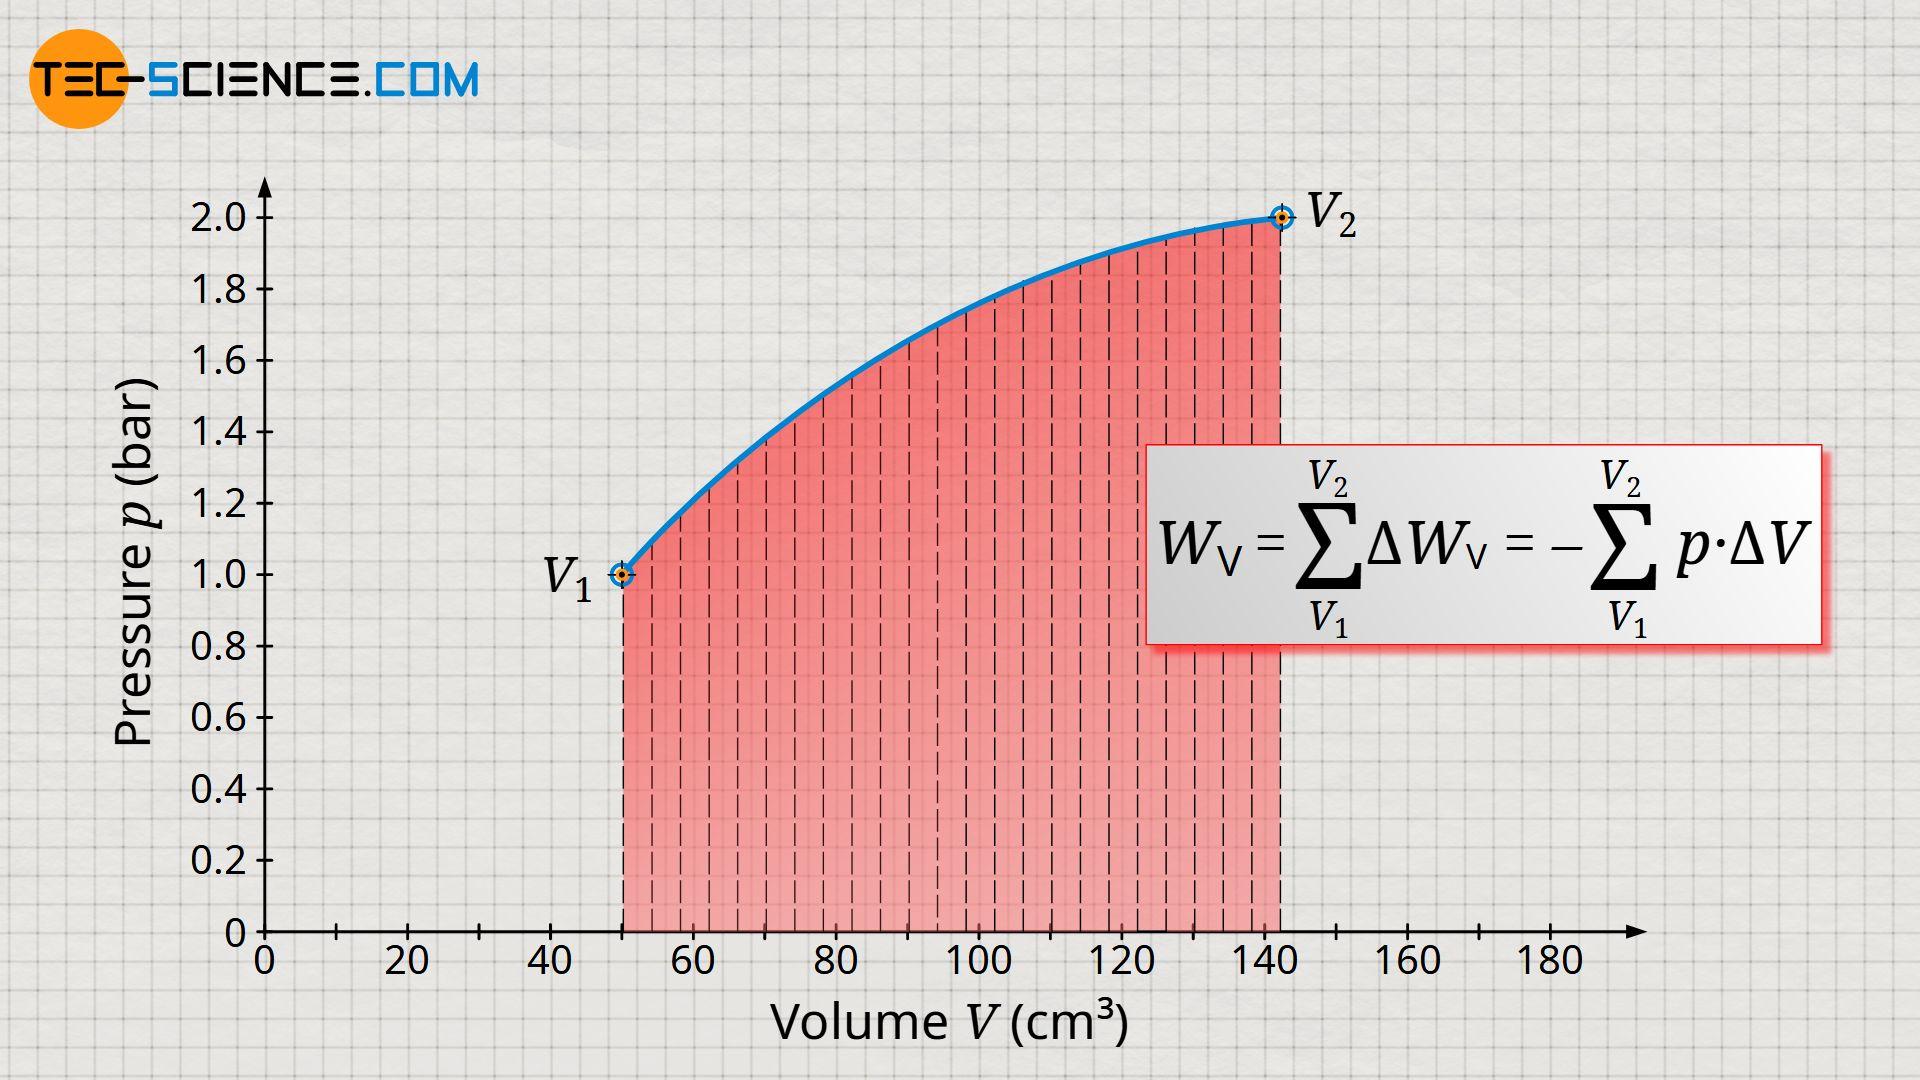 Summing up the infinitesimal pressure-volume work to the total displacement work